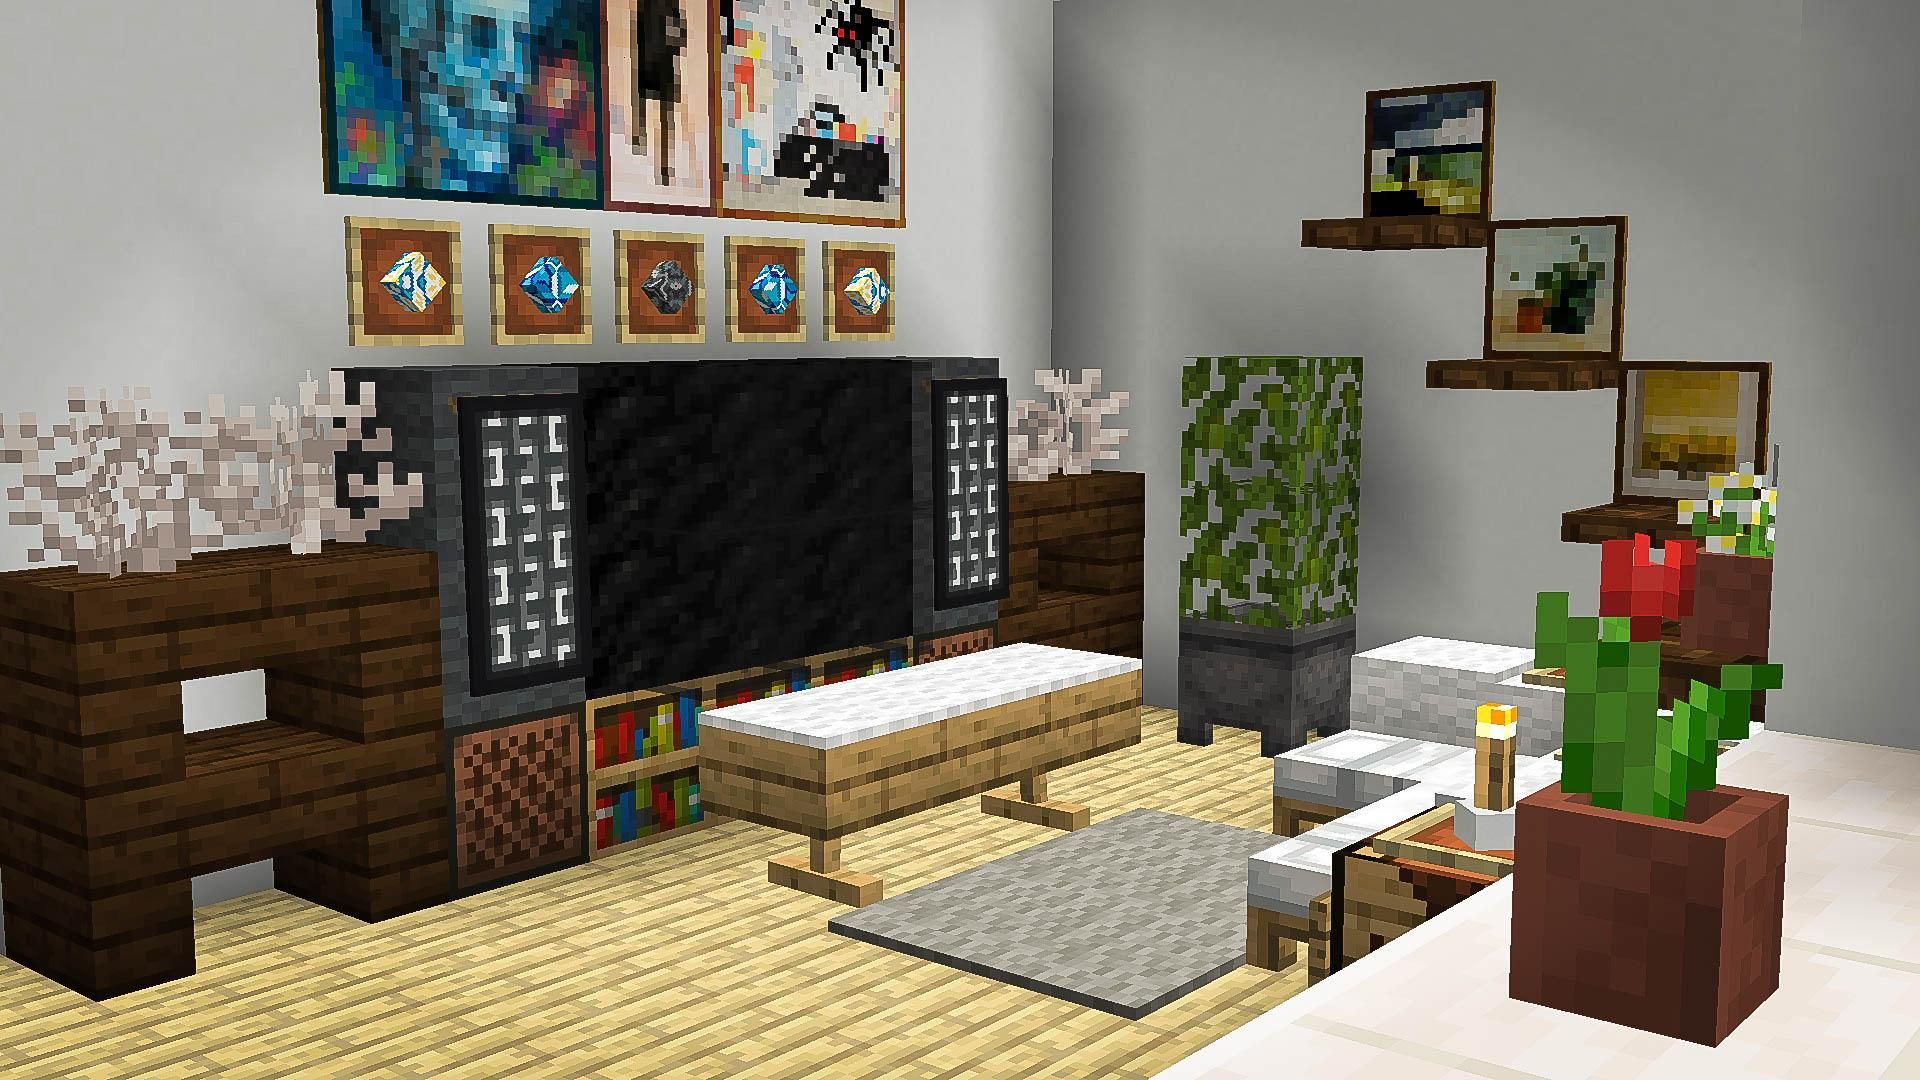 Living Room Minecraft House Decorating Ideas Homyracks